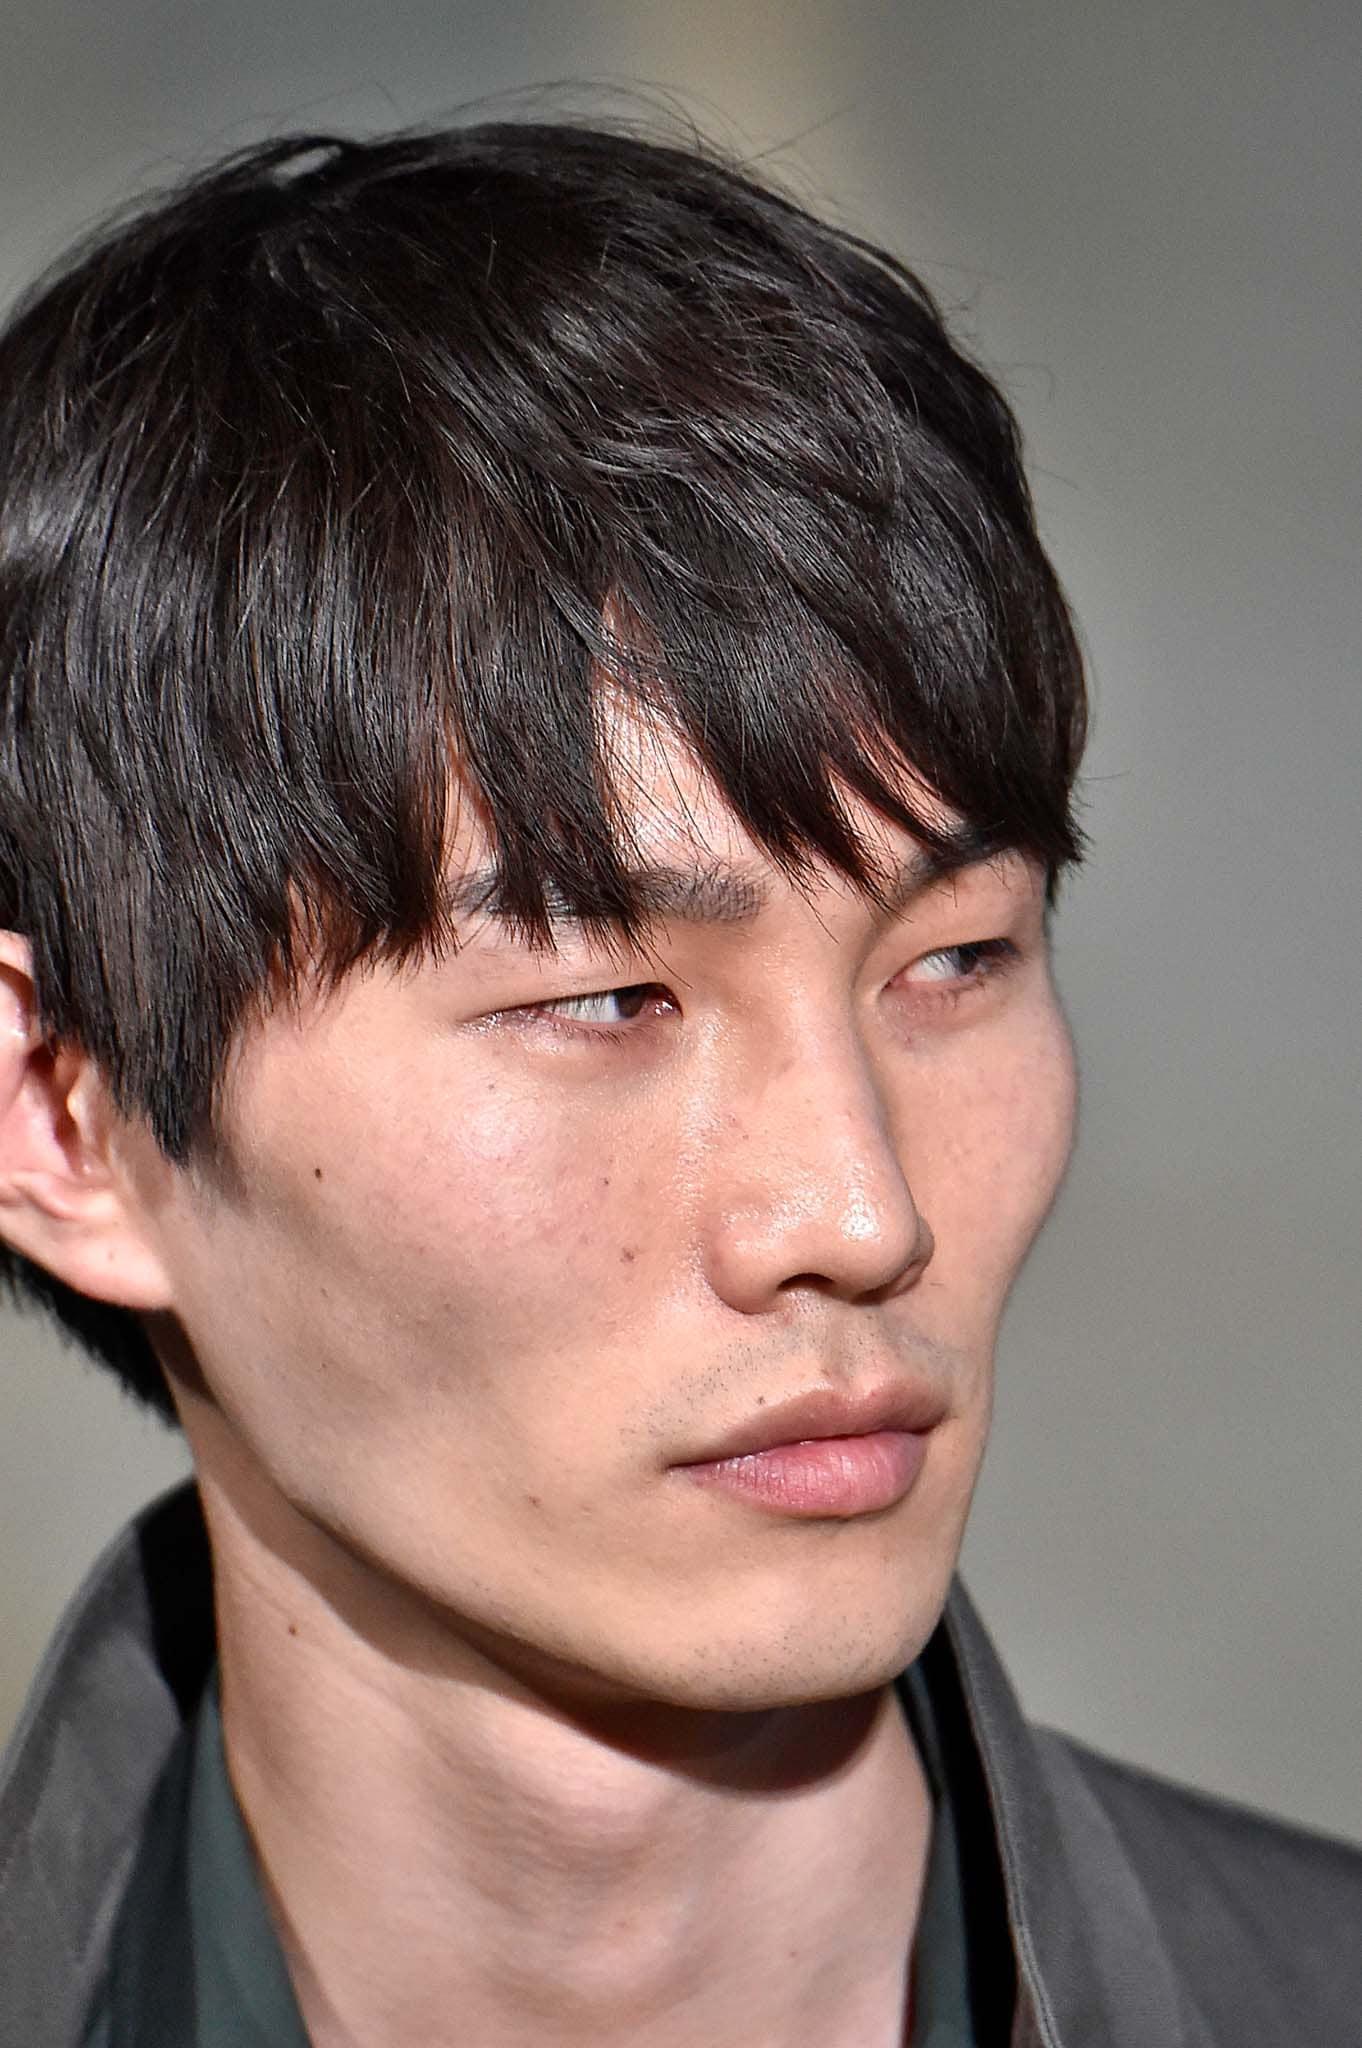 Hombre asiático con cabello corto peinado hacia adelante